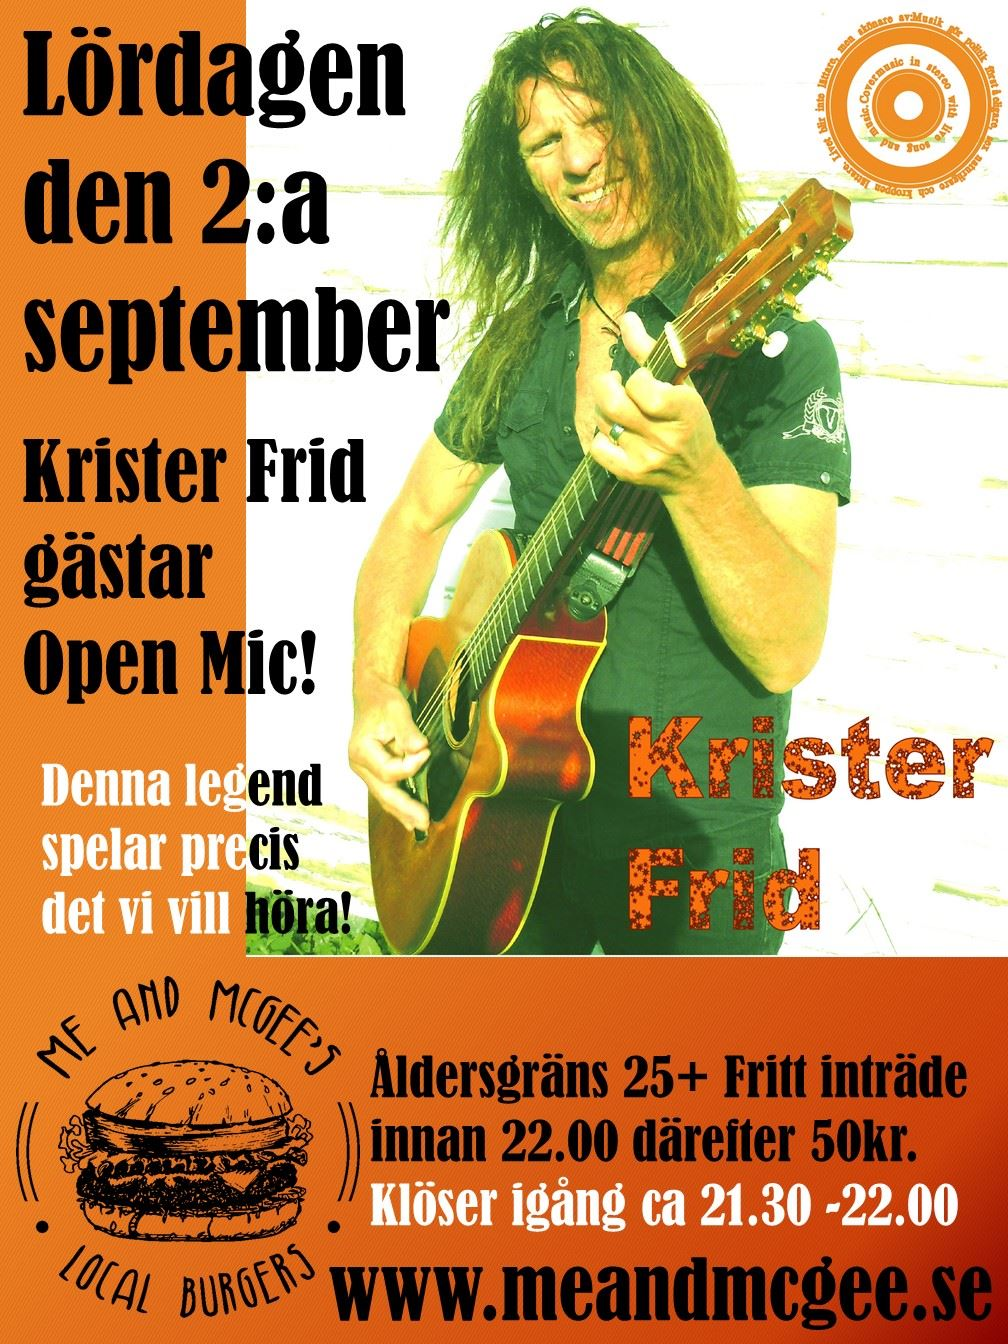 Krister Frid gästar Open mic!